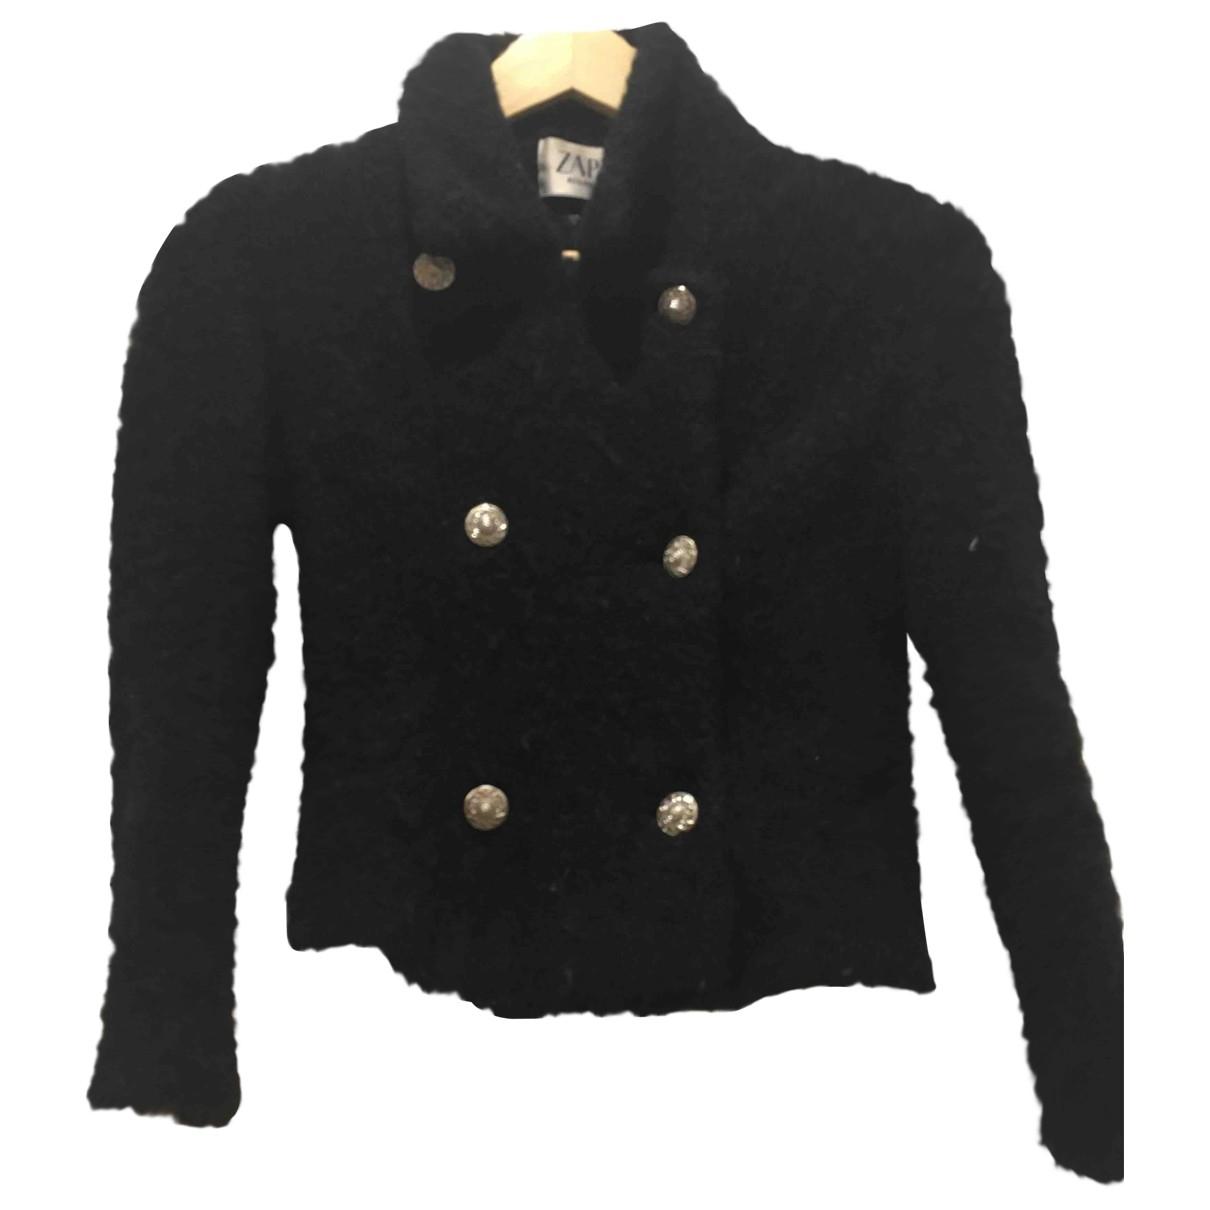 Zapa - Veste   pour femme en tweed - noir